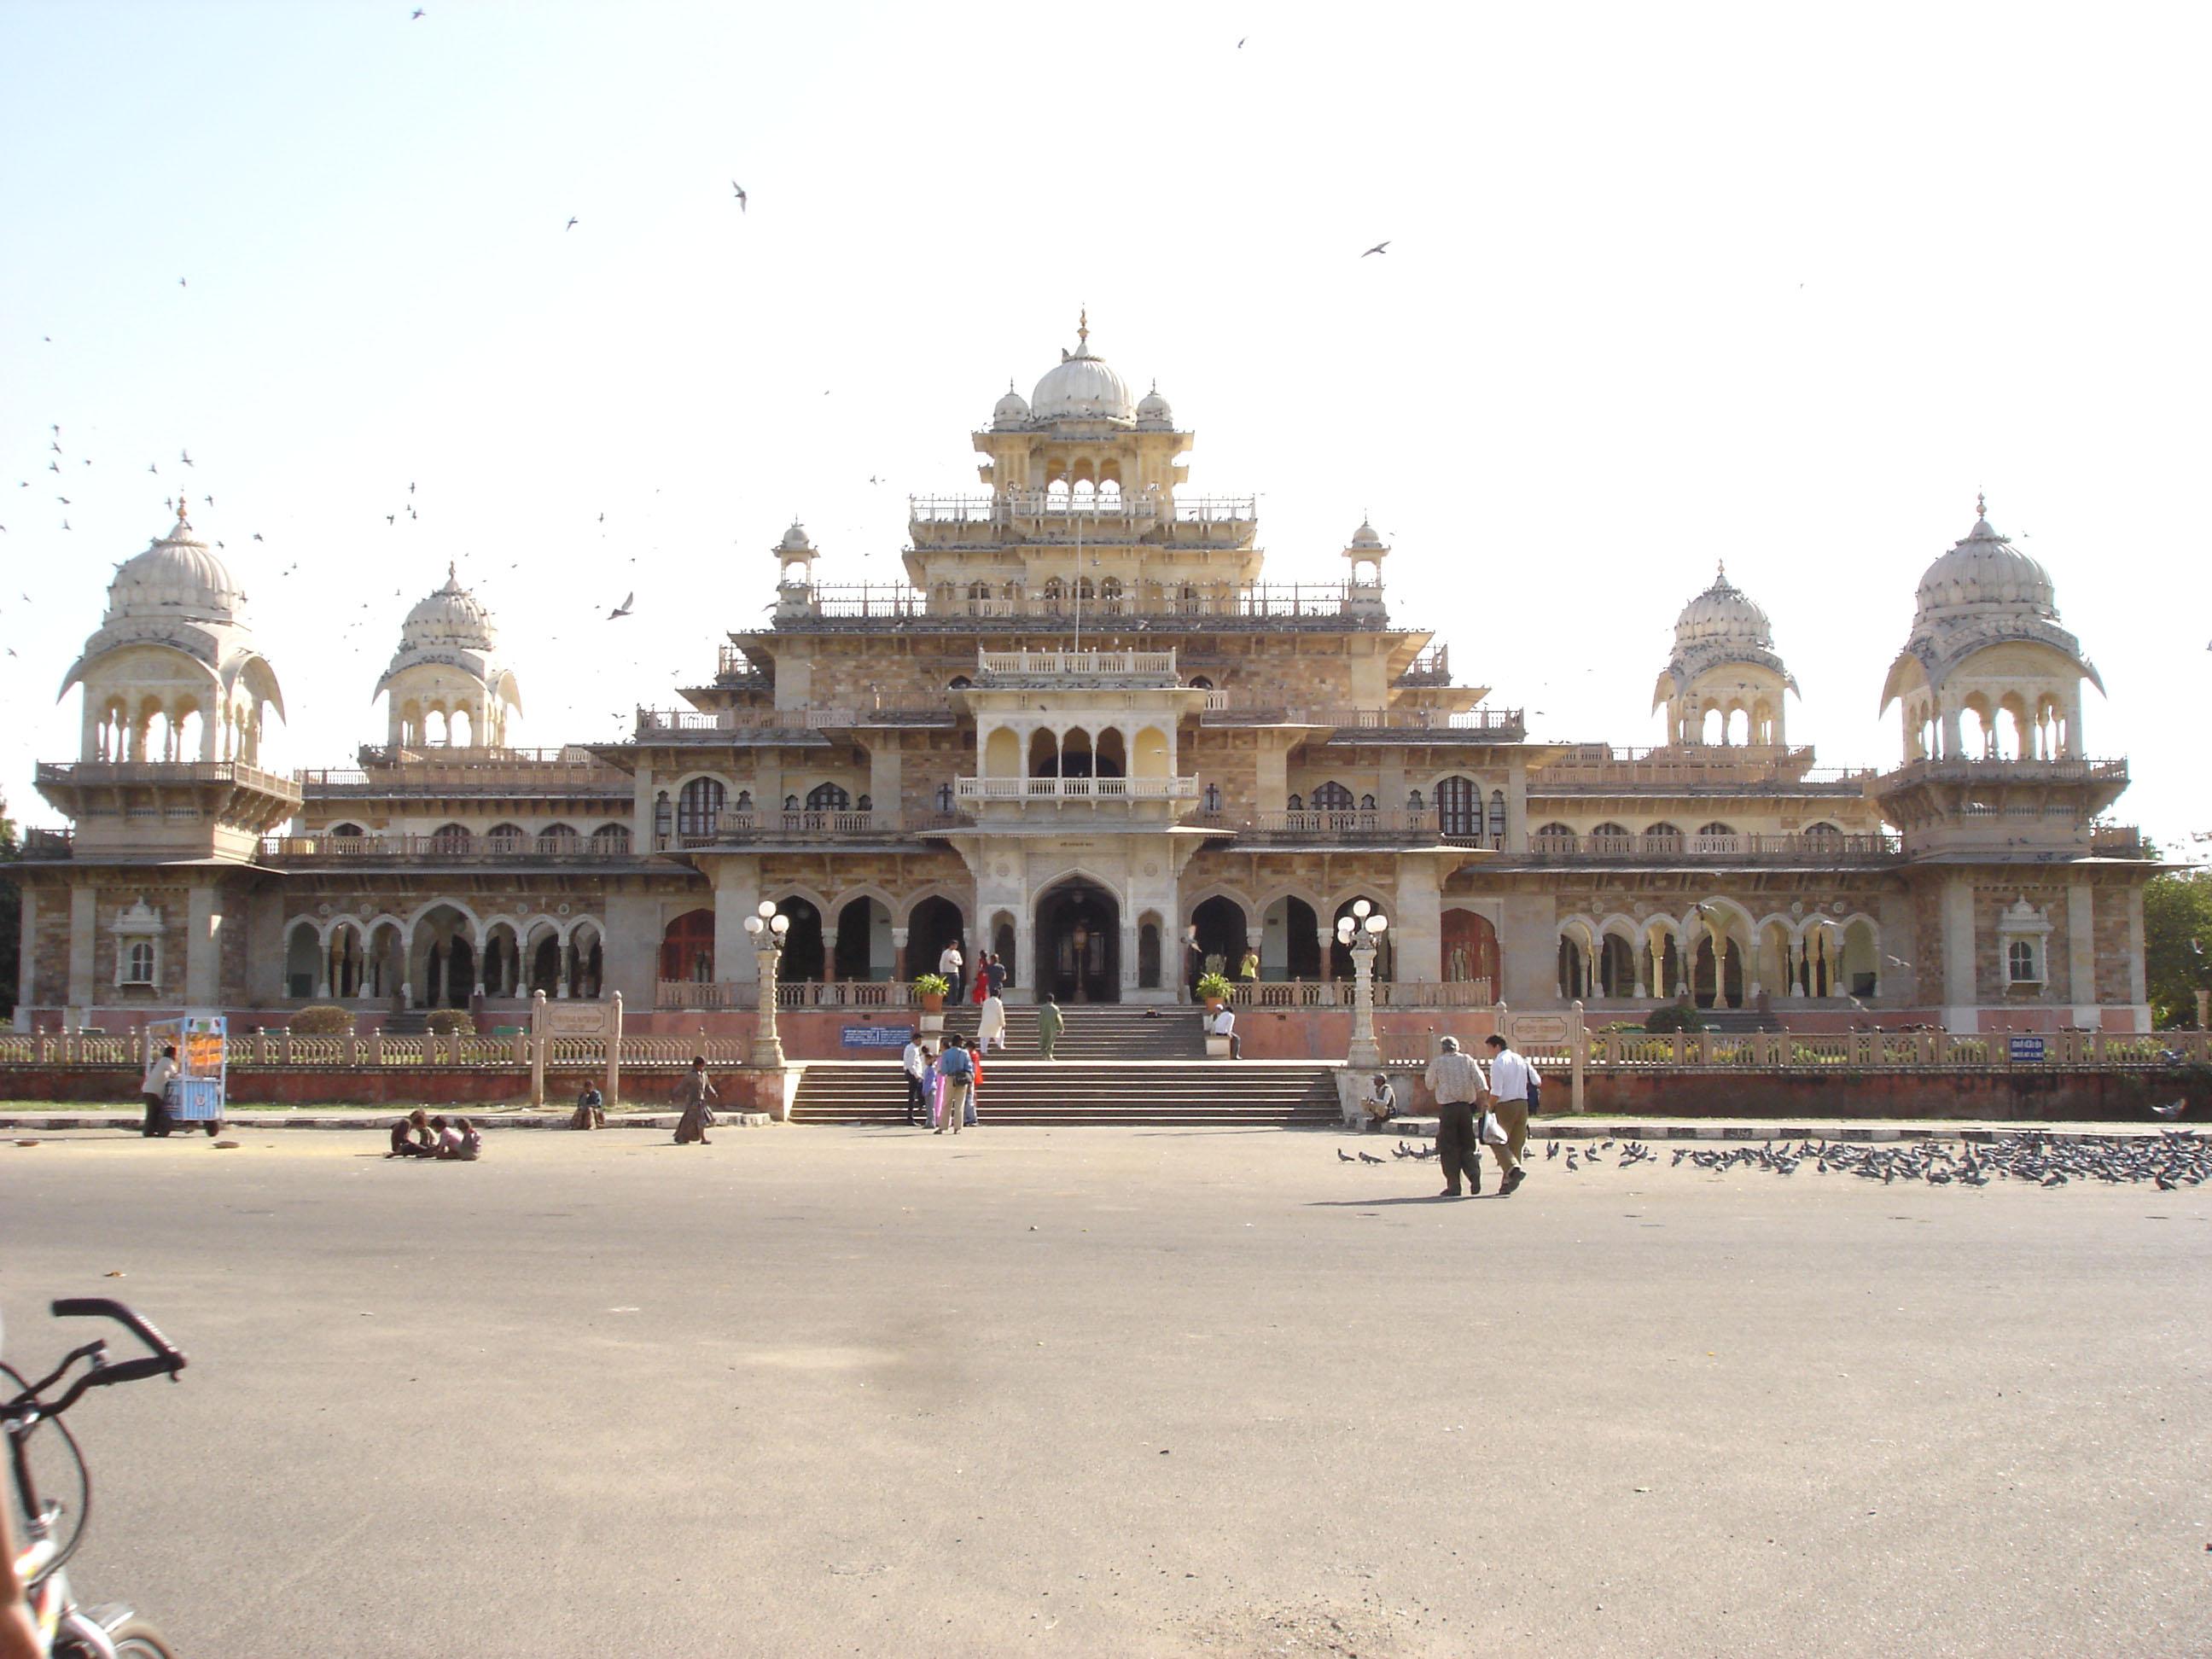 3J's of Rajasthan